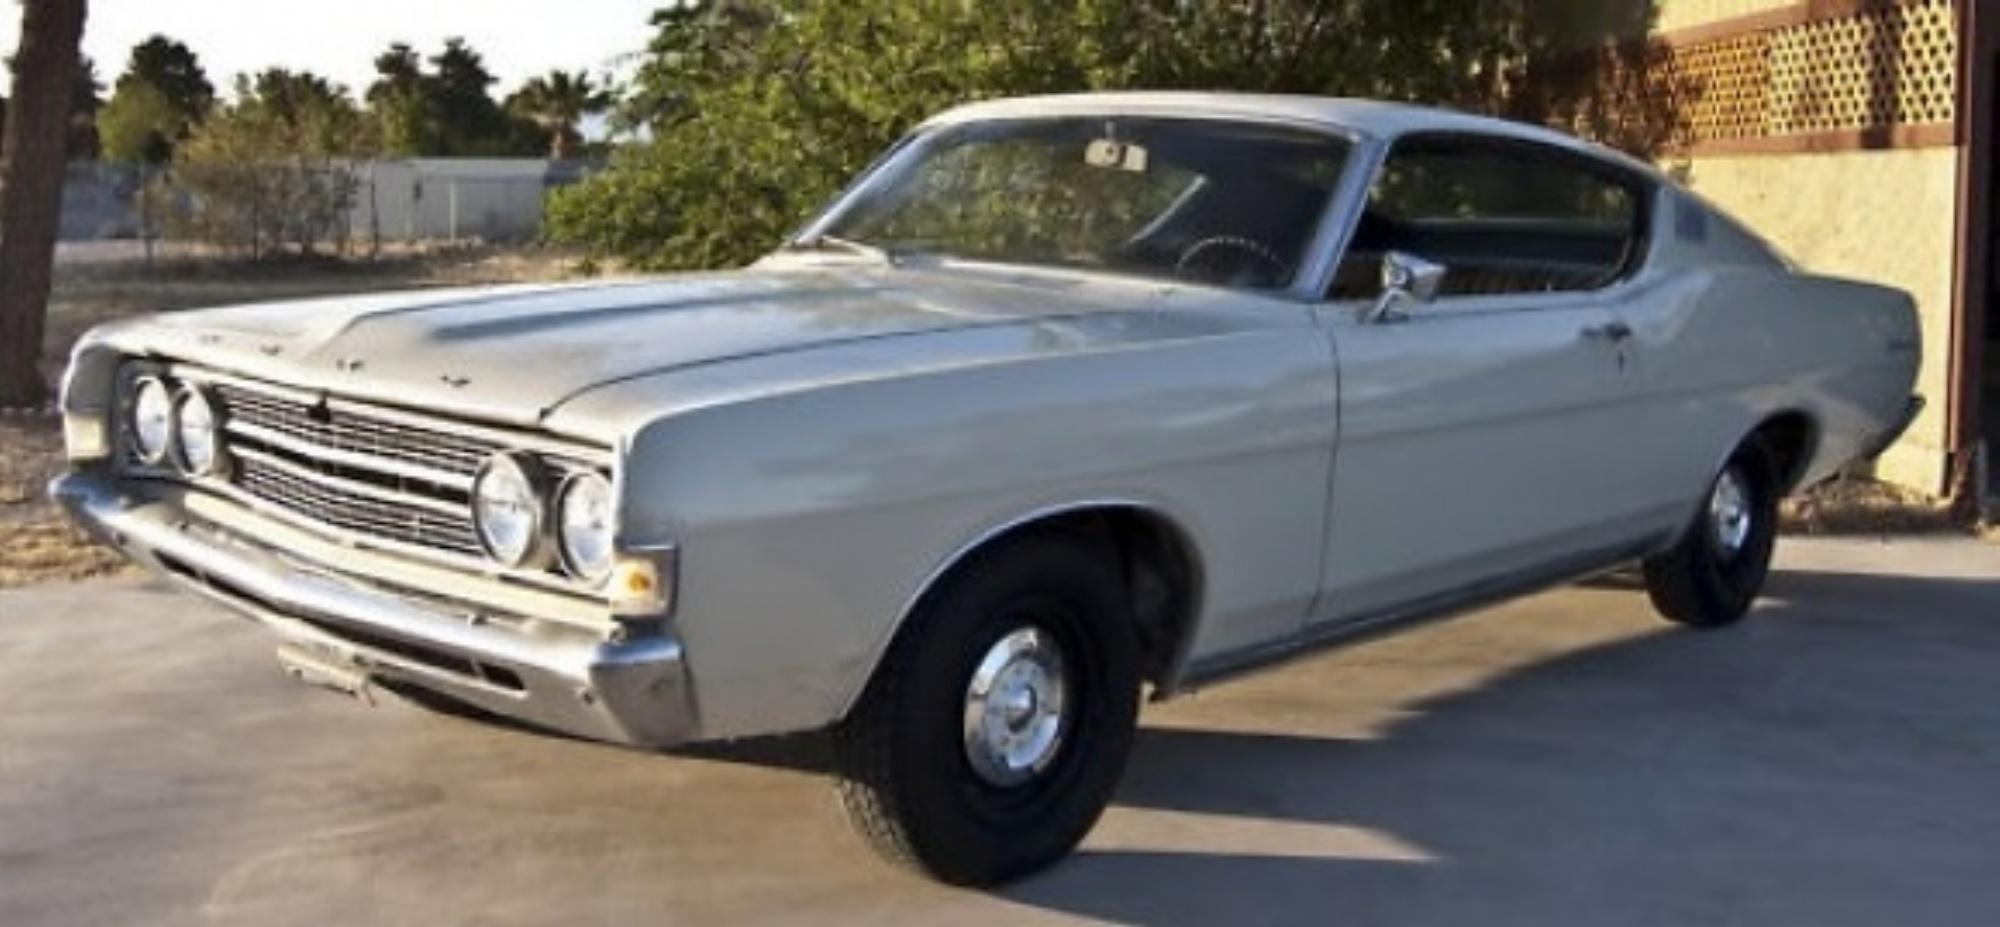 American Classic: 1968 Ford Fairlane 500 Fastback